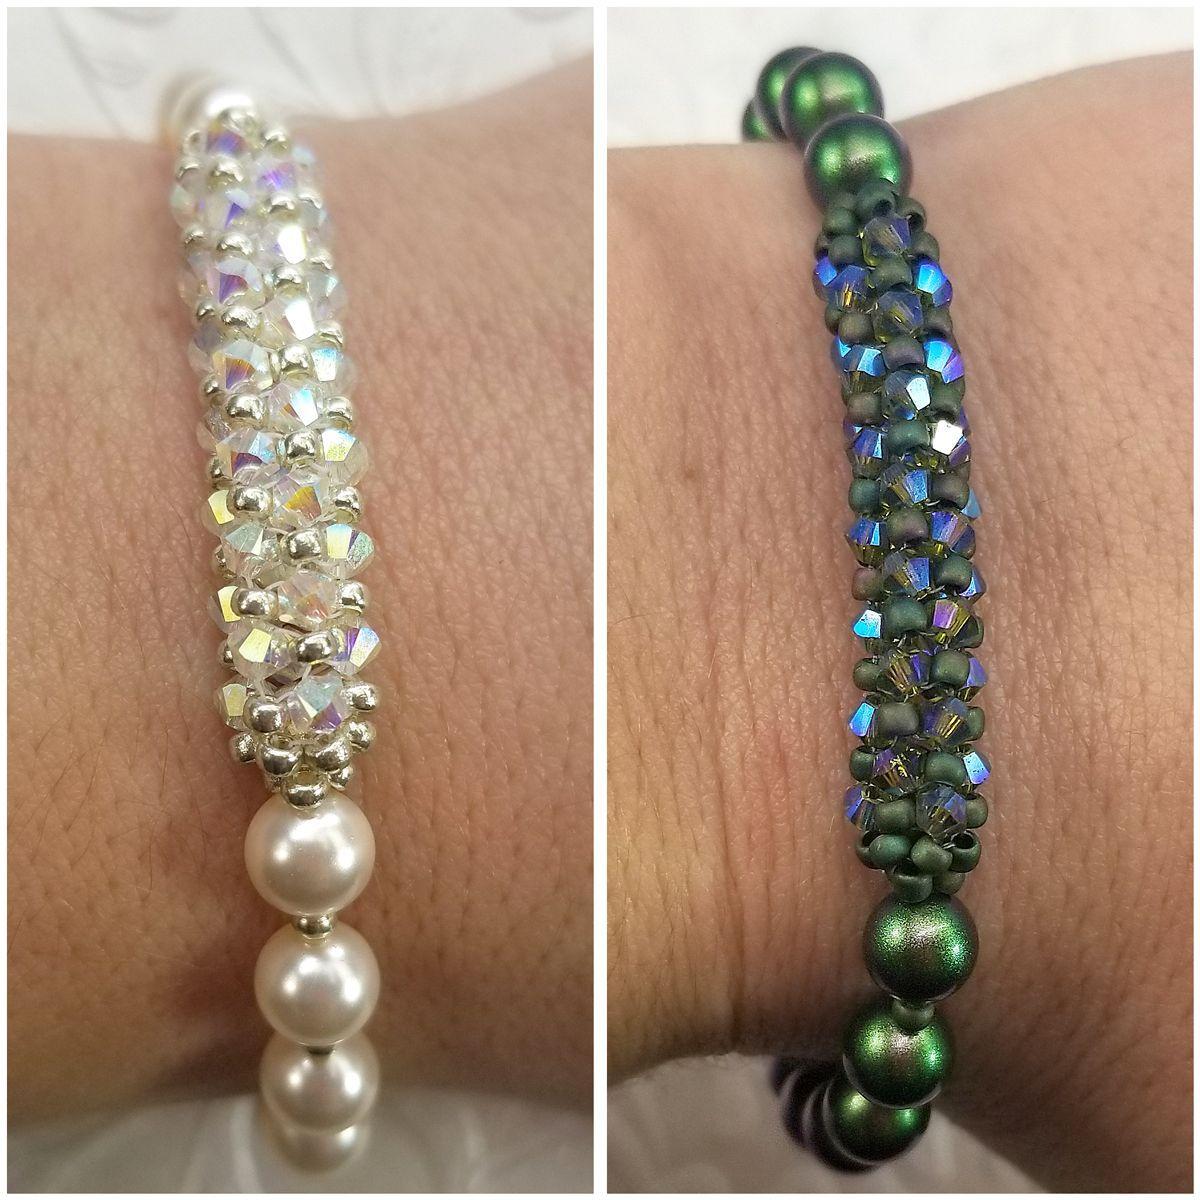 Pavé Swarovski Crystal  Pearl Bracelet VIDEO TUTORIAL  Pavé Swarovski Crystal  Pearl Bracelet by Leah Wyckoff  Eureka Crystal Beads